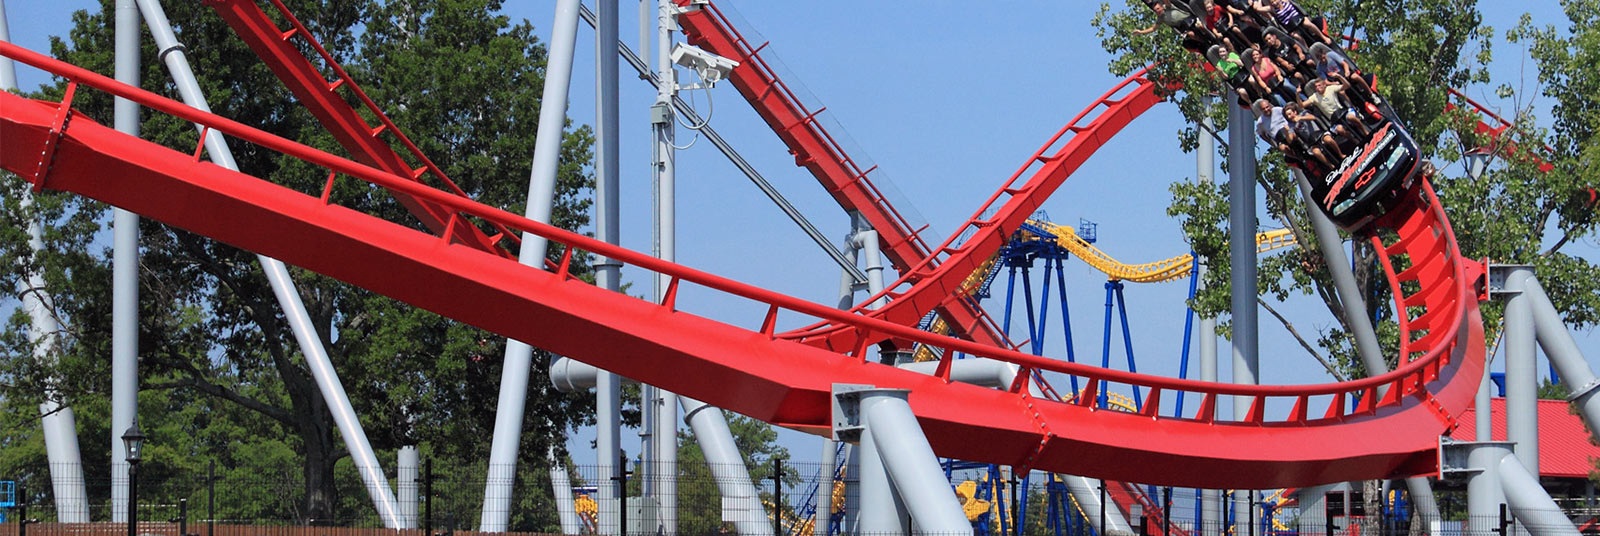 Carowinds Intimidator Theme Park